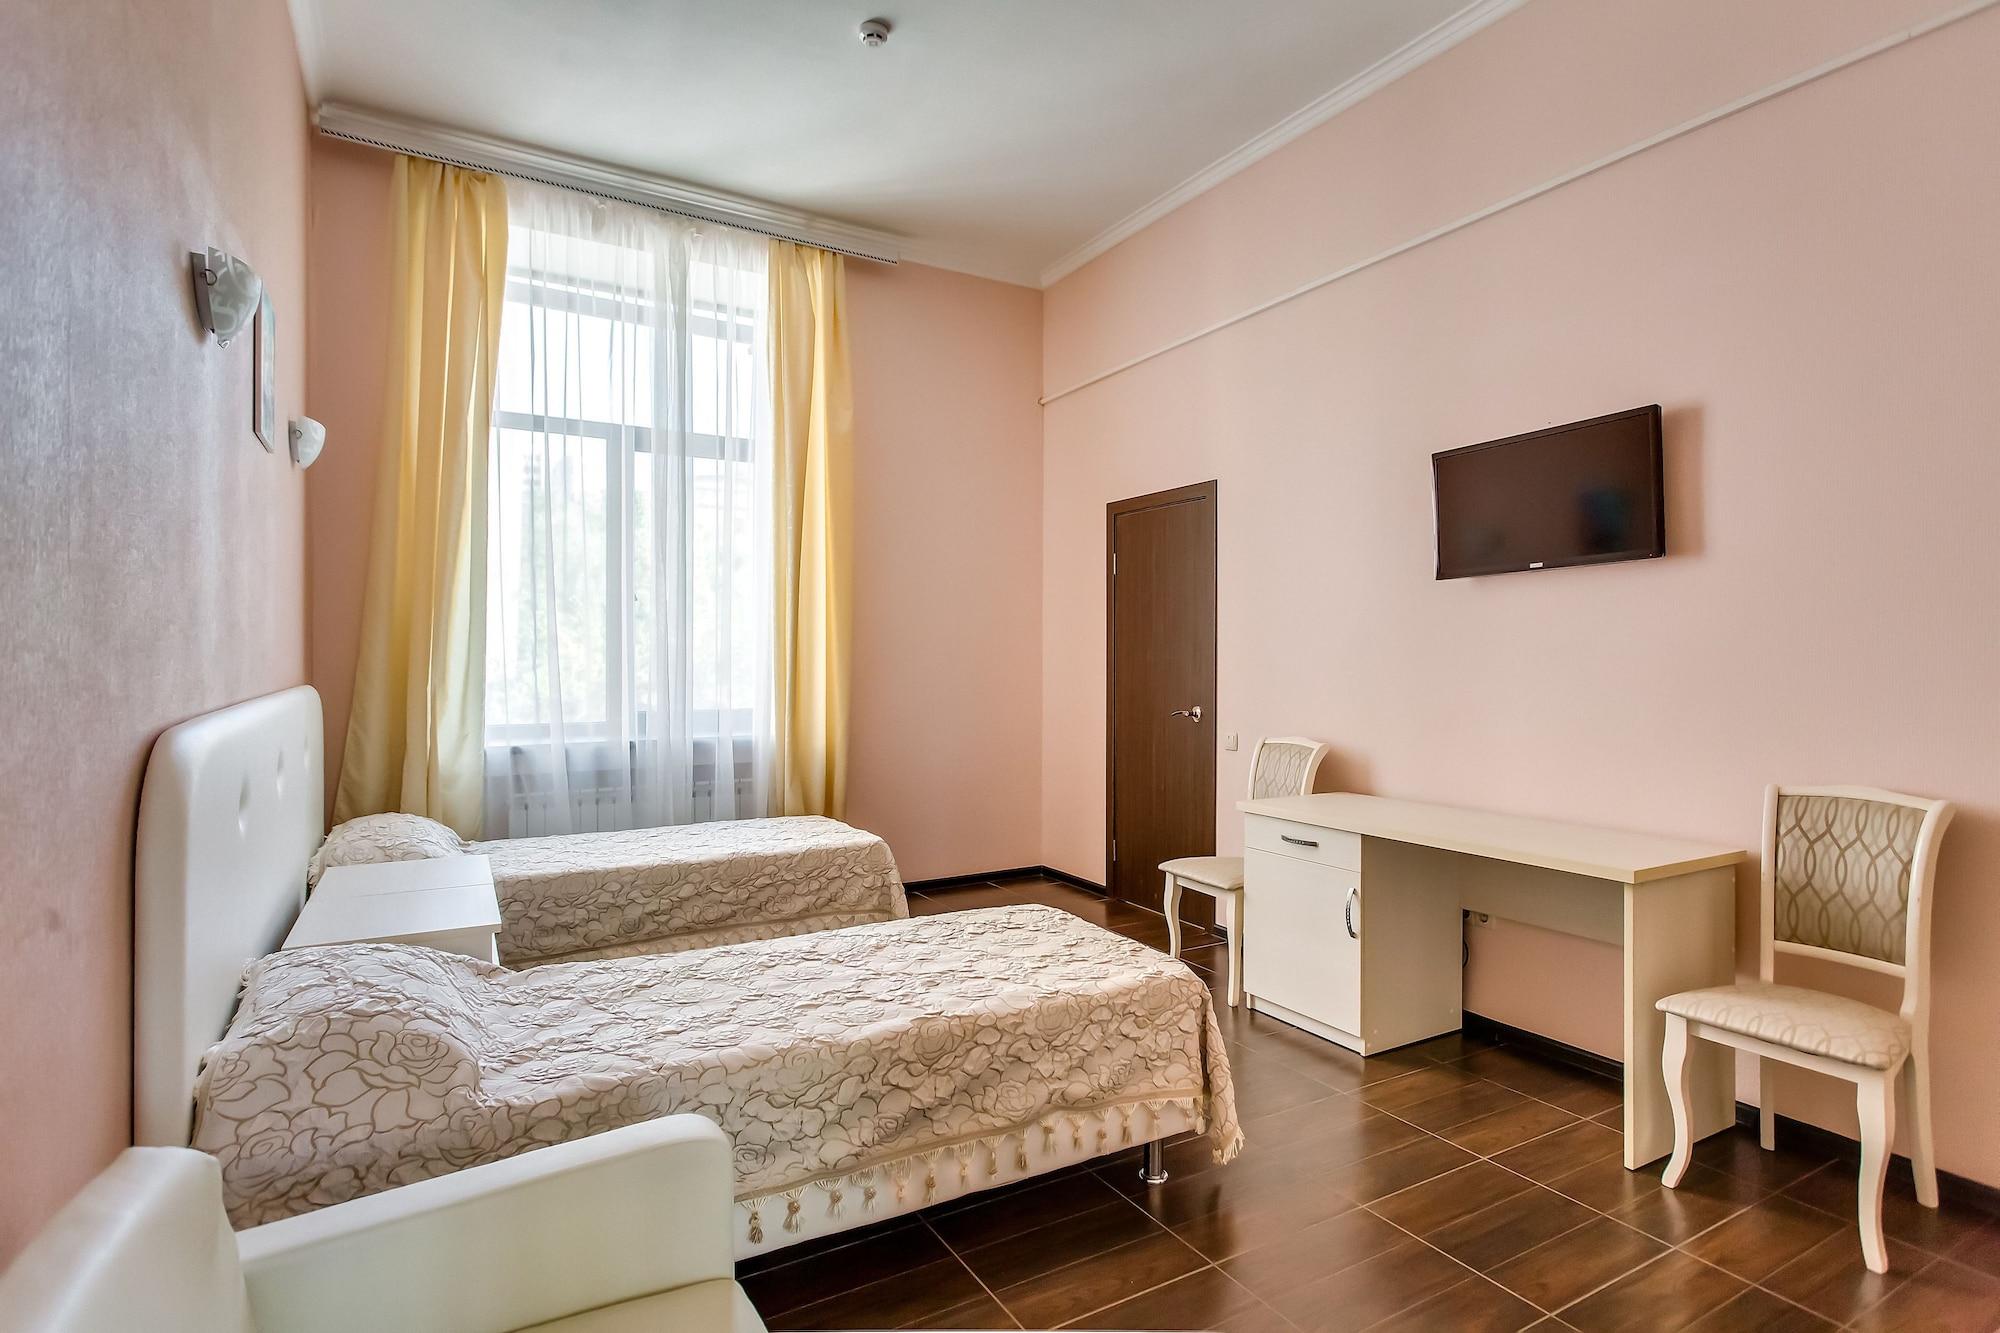 Hotel Ostrovsky, Aksayskiy rayon